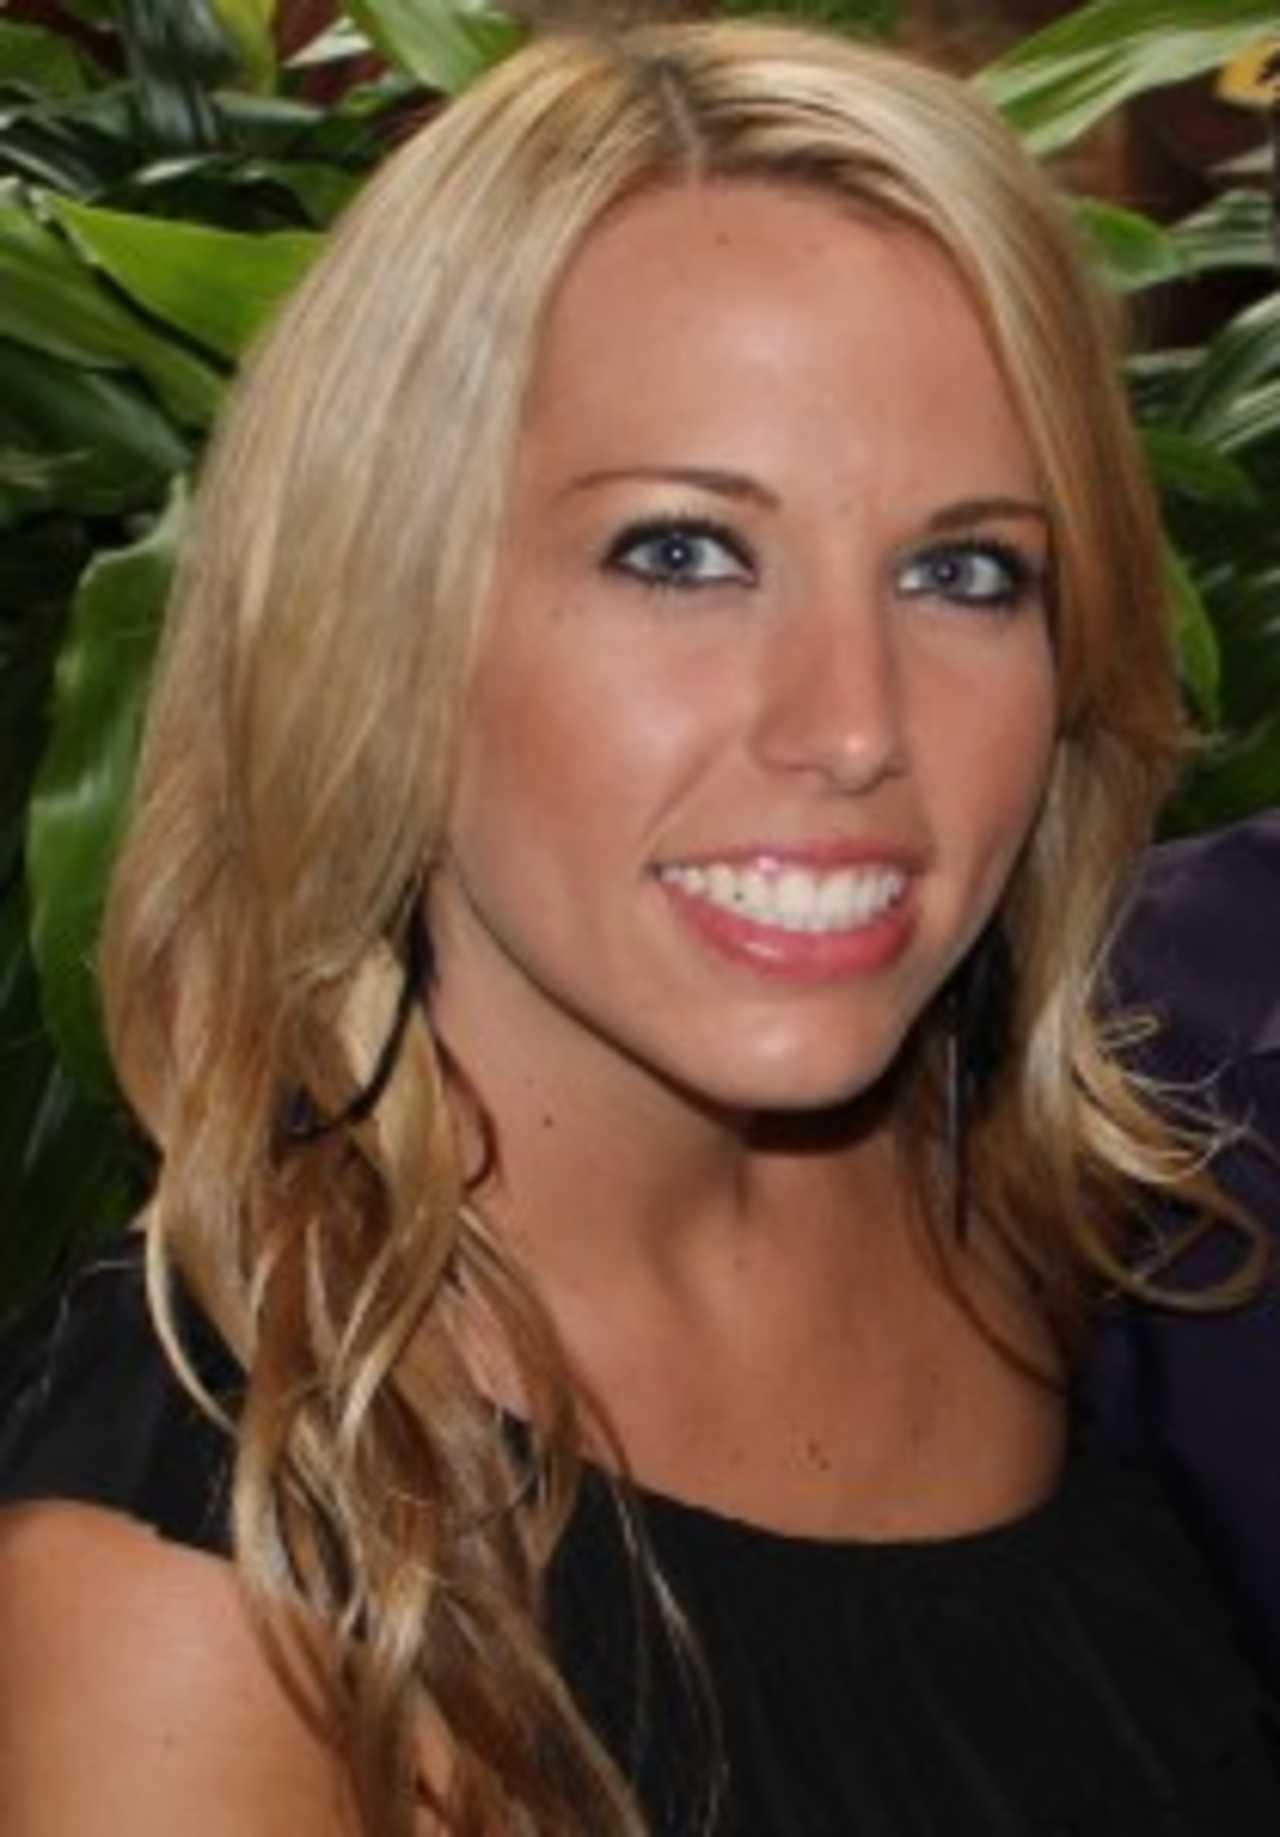 Adjust Your Life Chiropractic - Colleen Ford, DC - Medical - Chiropractors in Bradenton FL